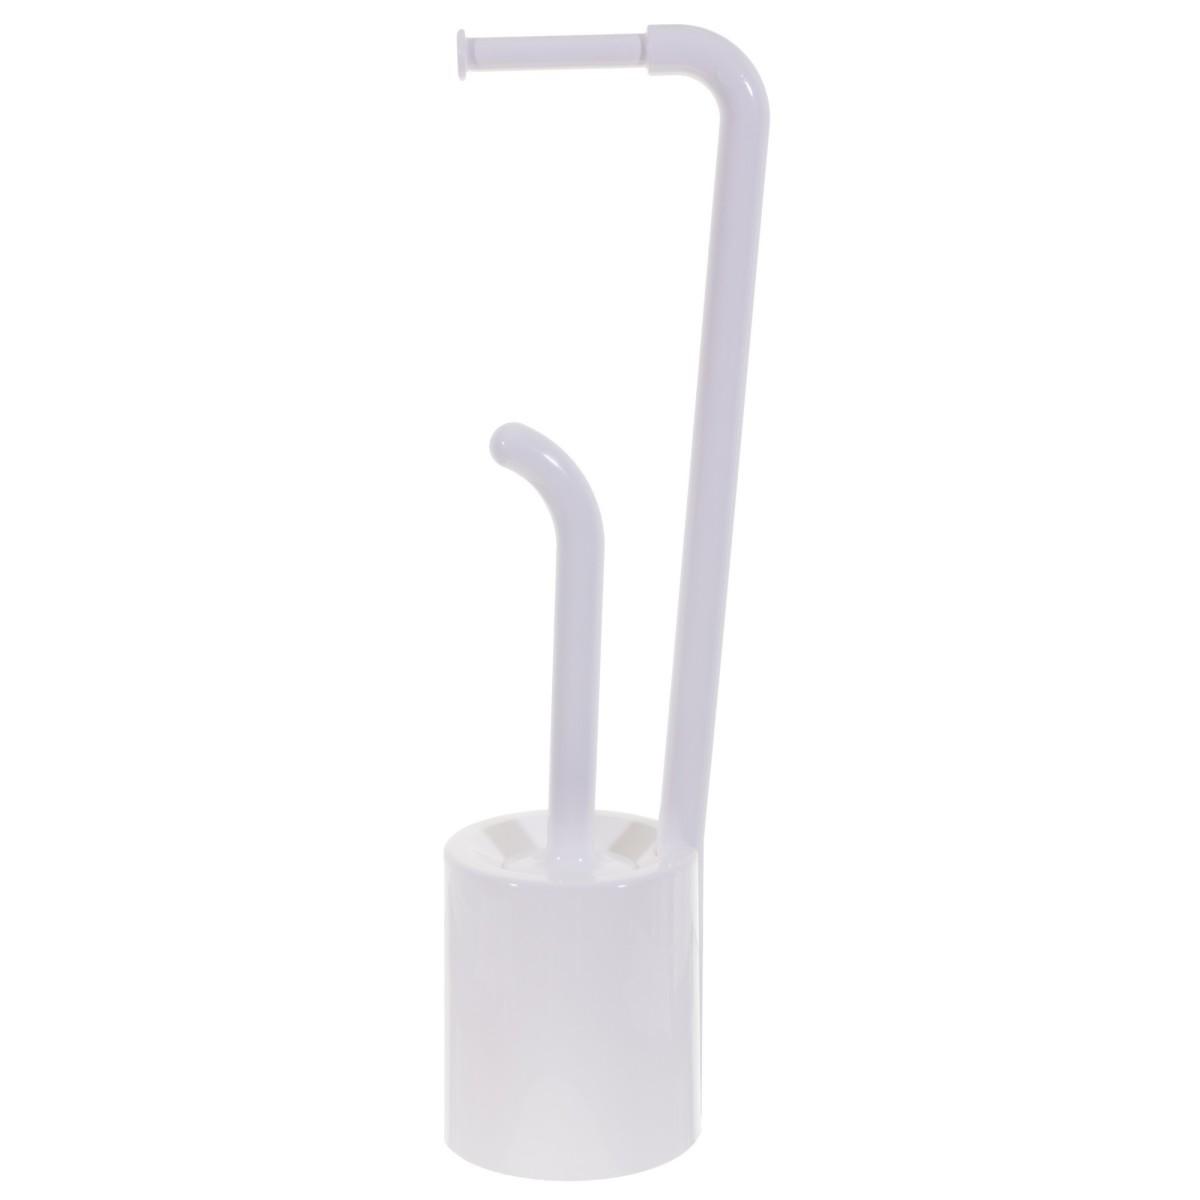 Стойка для ванной комнаты напольная цвет белый